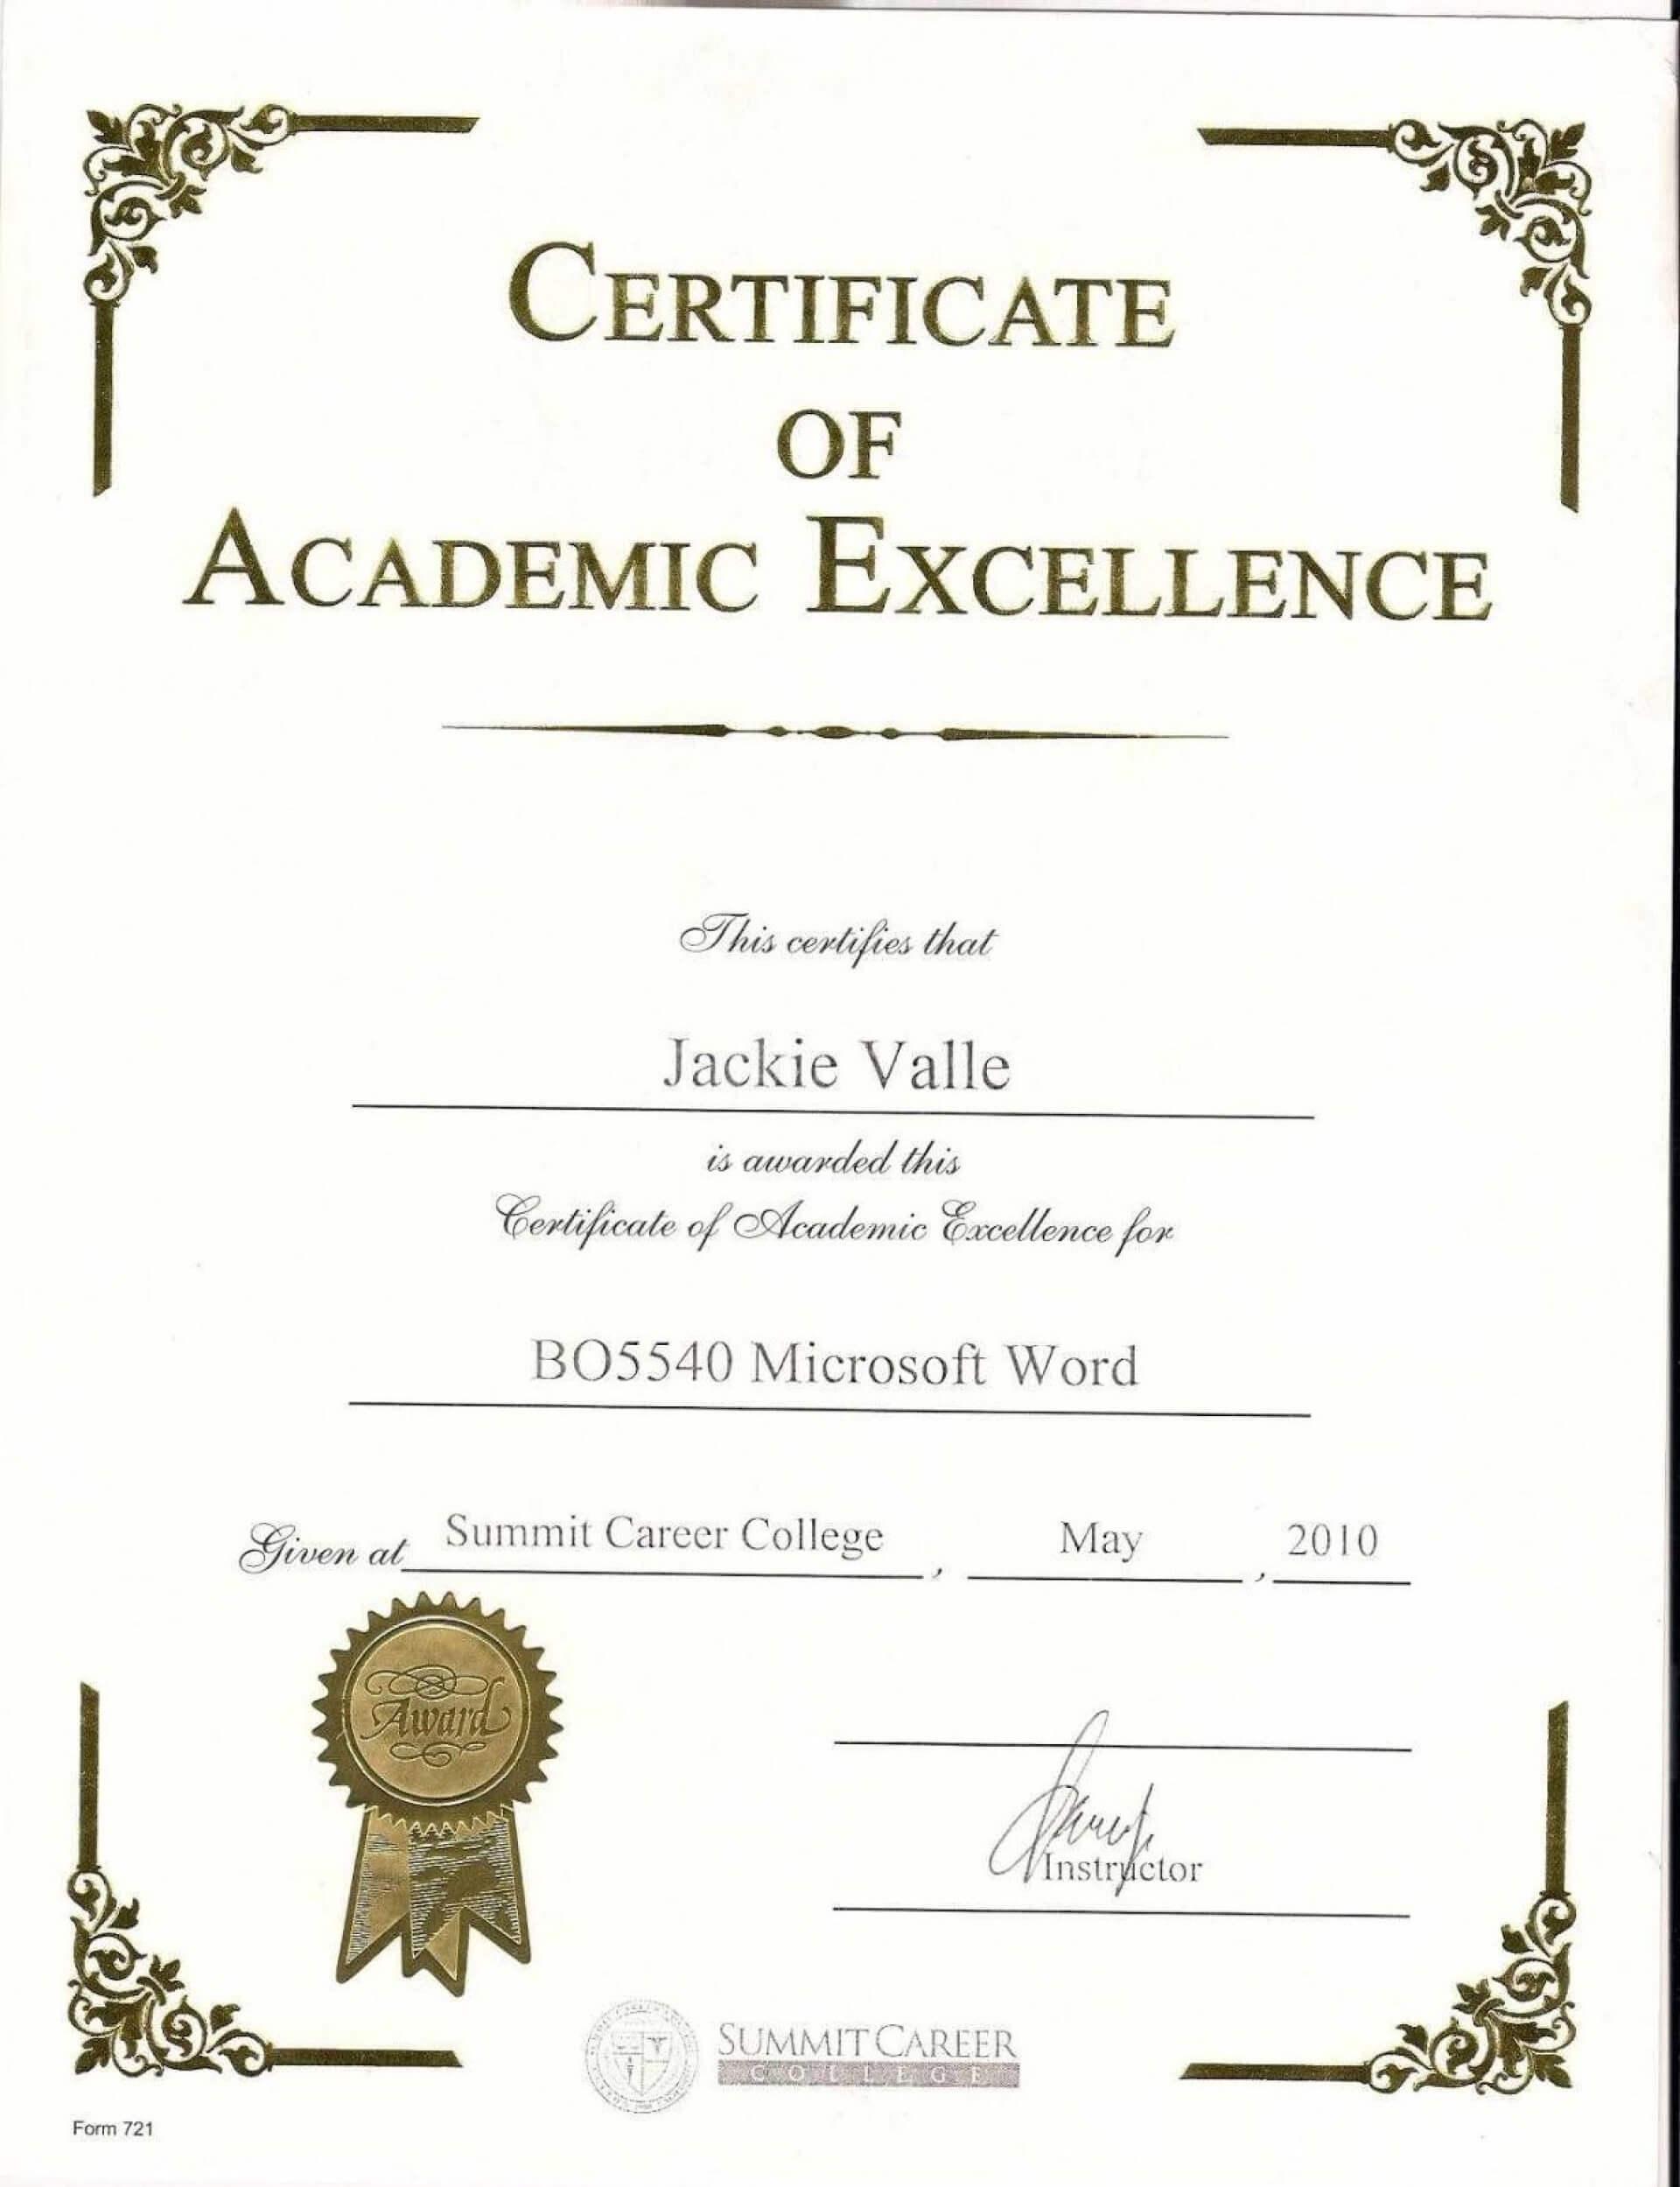 038 Award Certificate Template Word Free Printable Editable With Academic Award Certificate Template